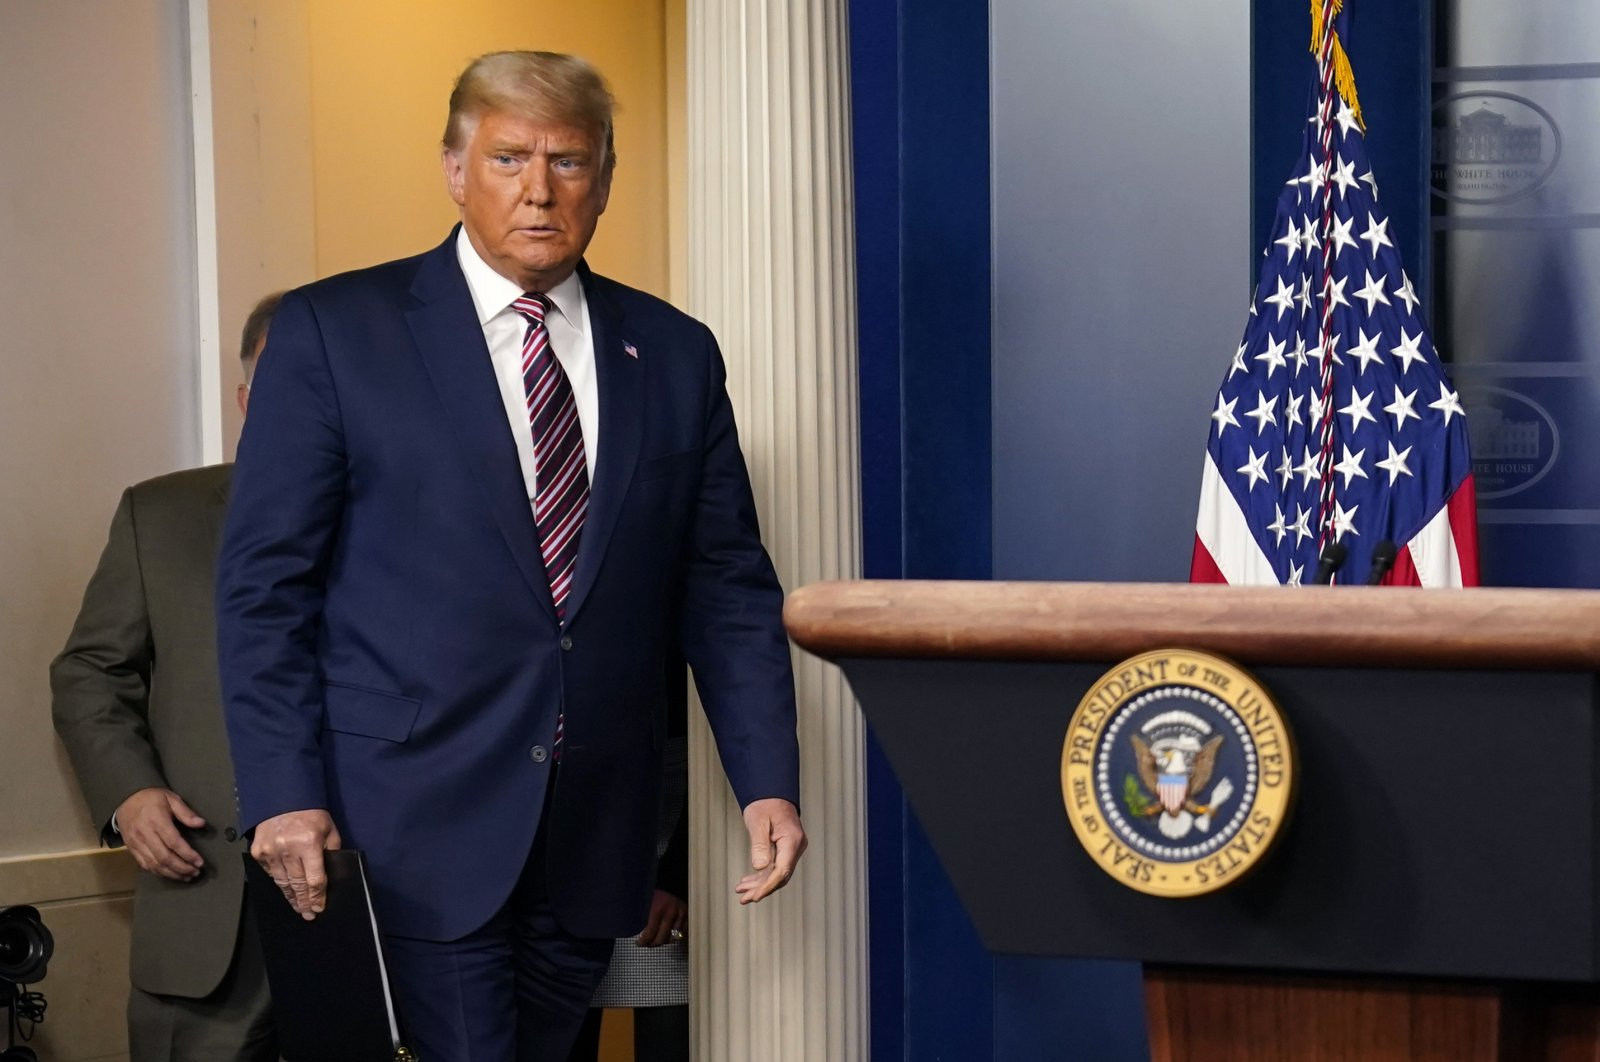 U.S. President Donald Trump arrives to speak at the White House, Washington, D.C., U.S., Nov. 5, 2020. (AP Photo)